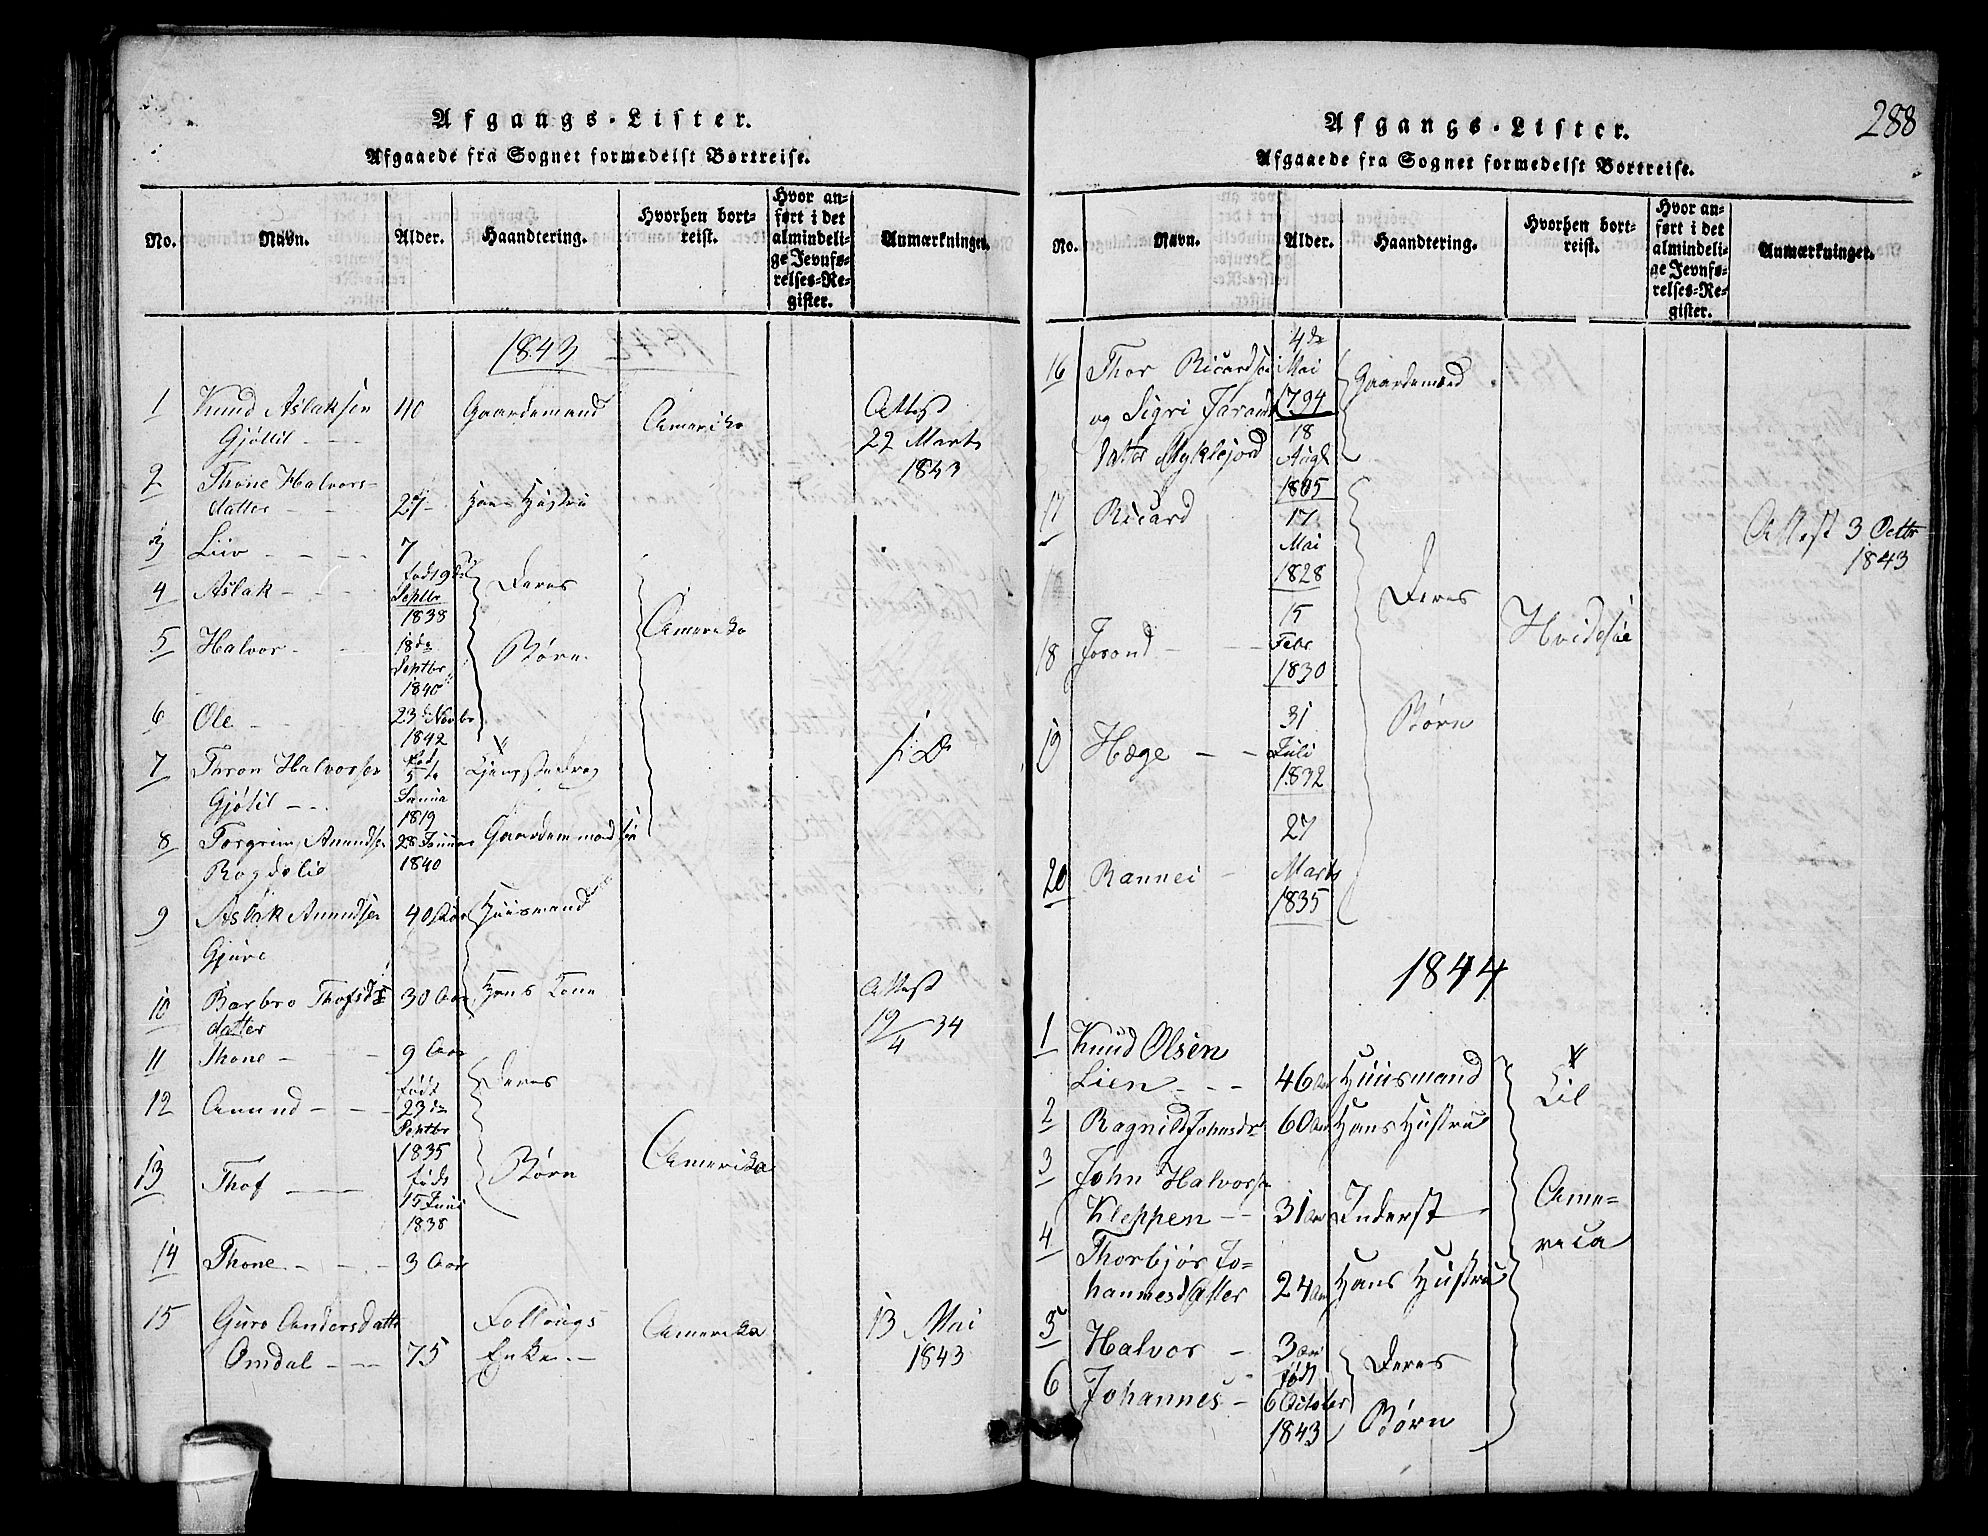 SAKO, Lårdal kirkebøker, G/Gb/L0001: Klokkerbok nr. II 1, 1815-1865, s. 288